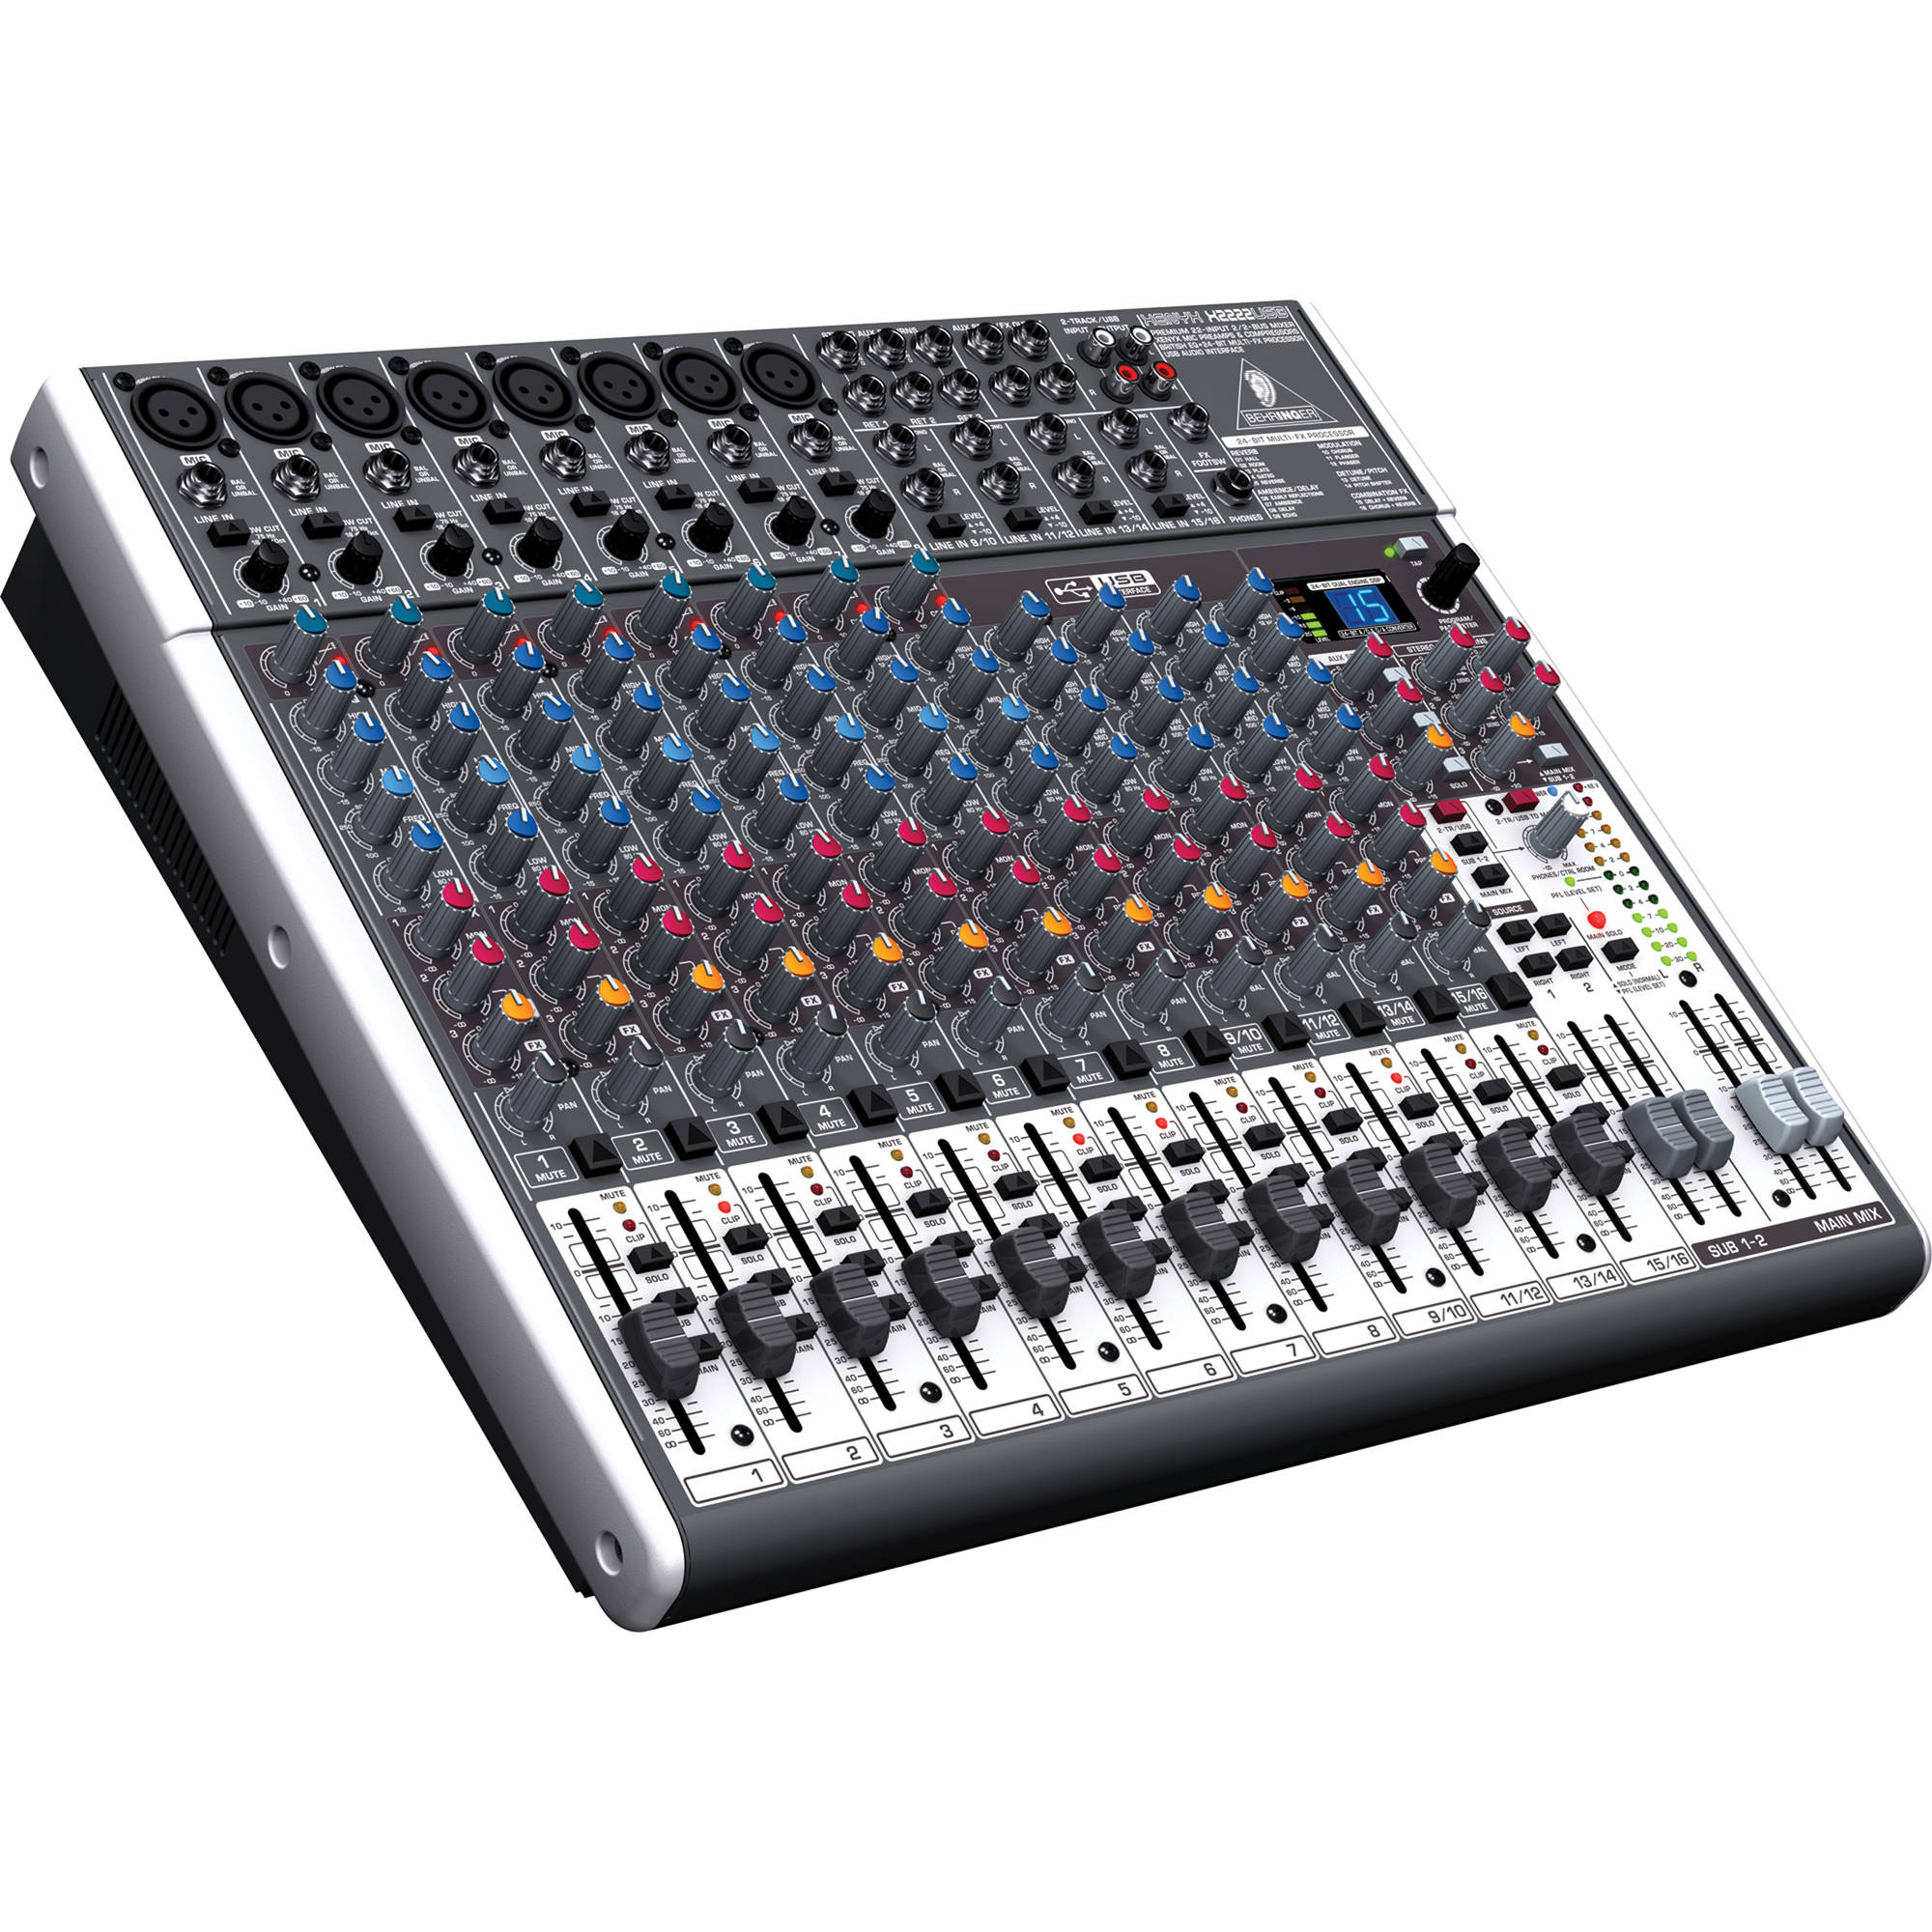 behringer xenyx x2222usb 22 input usb audio mixer x2222usb b h rh bhphotovideo com Behringer Xenyx 802 Mixer Setup Behringer PMP1680S Powered Mixers